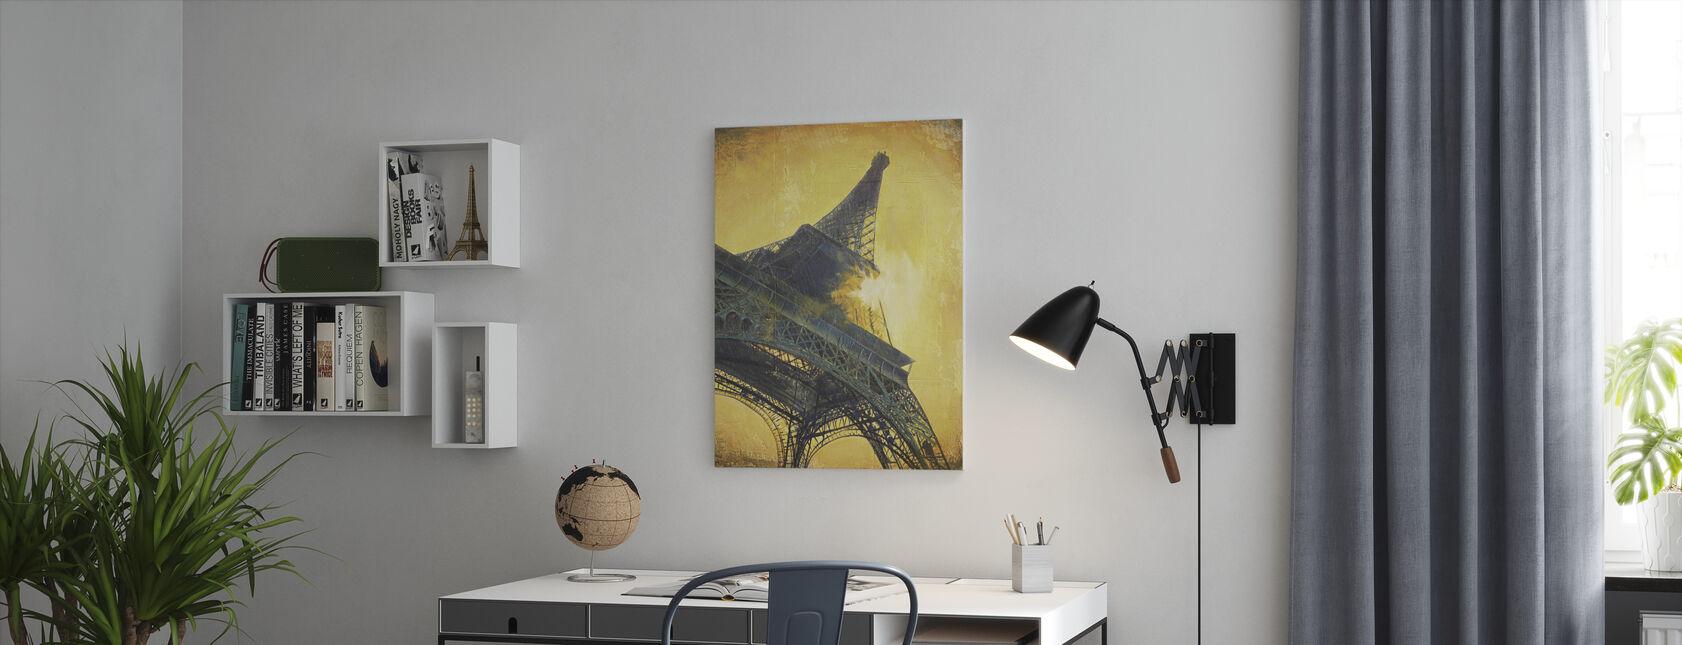 Parijs bij Sunset - Canvas print - Kantoor